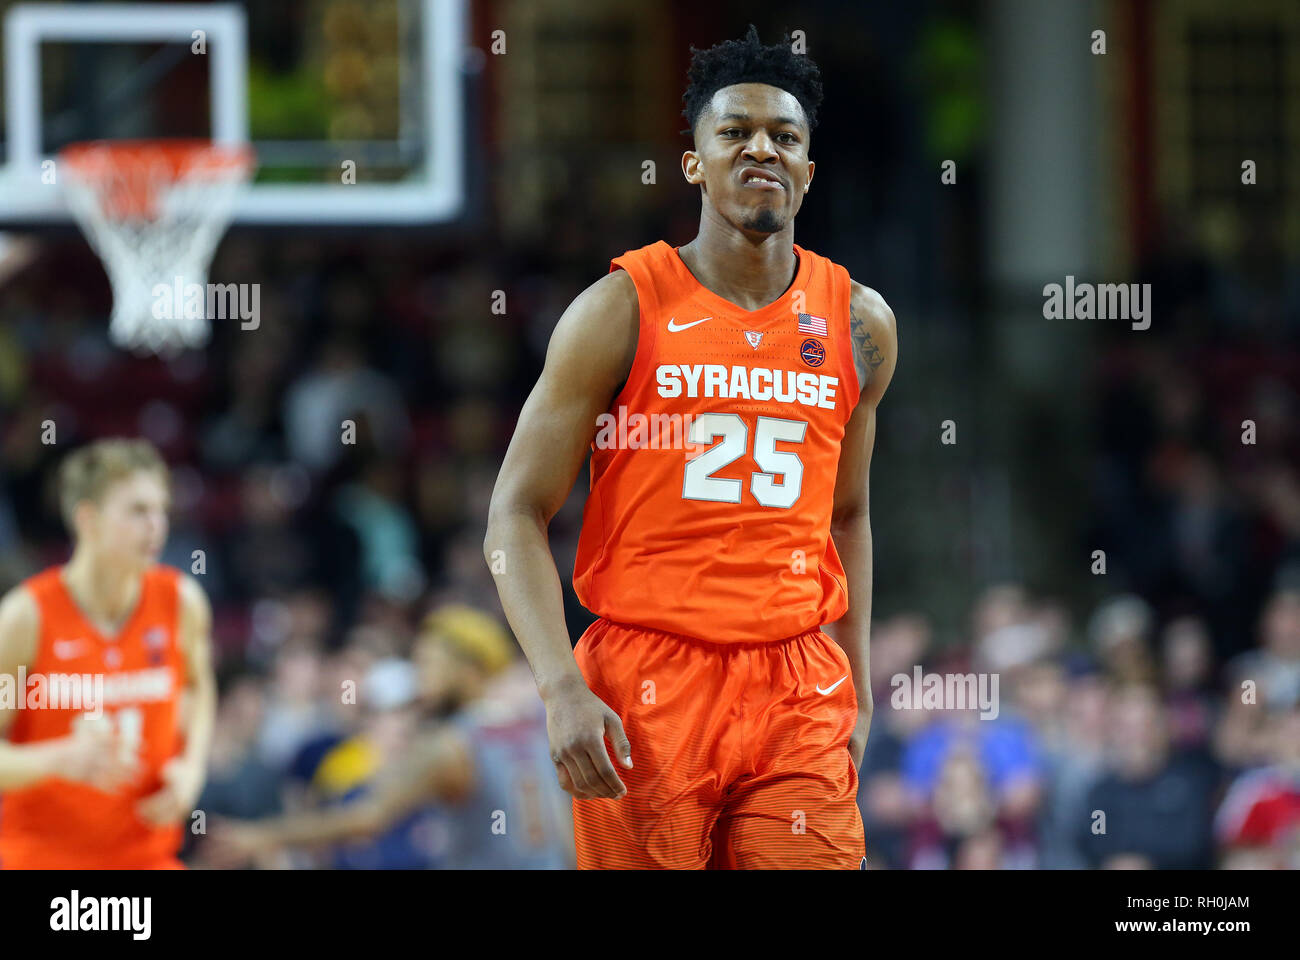 Conte Forum 30th Jan 2019 Ma Usa Syracuse Orange Guard Tyus